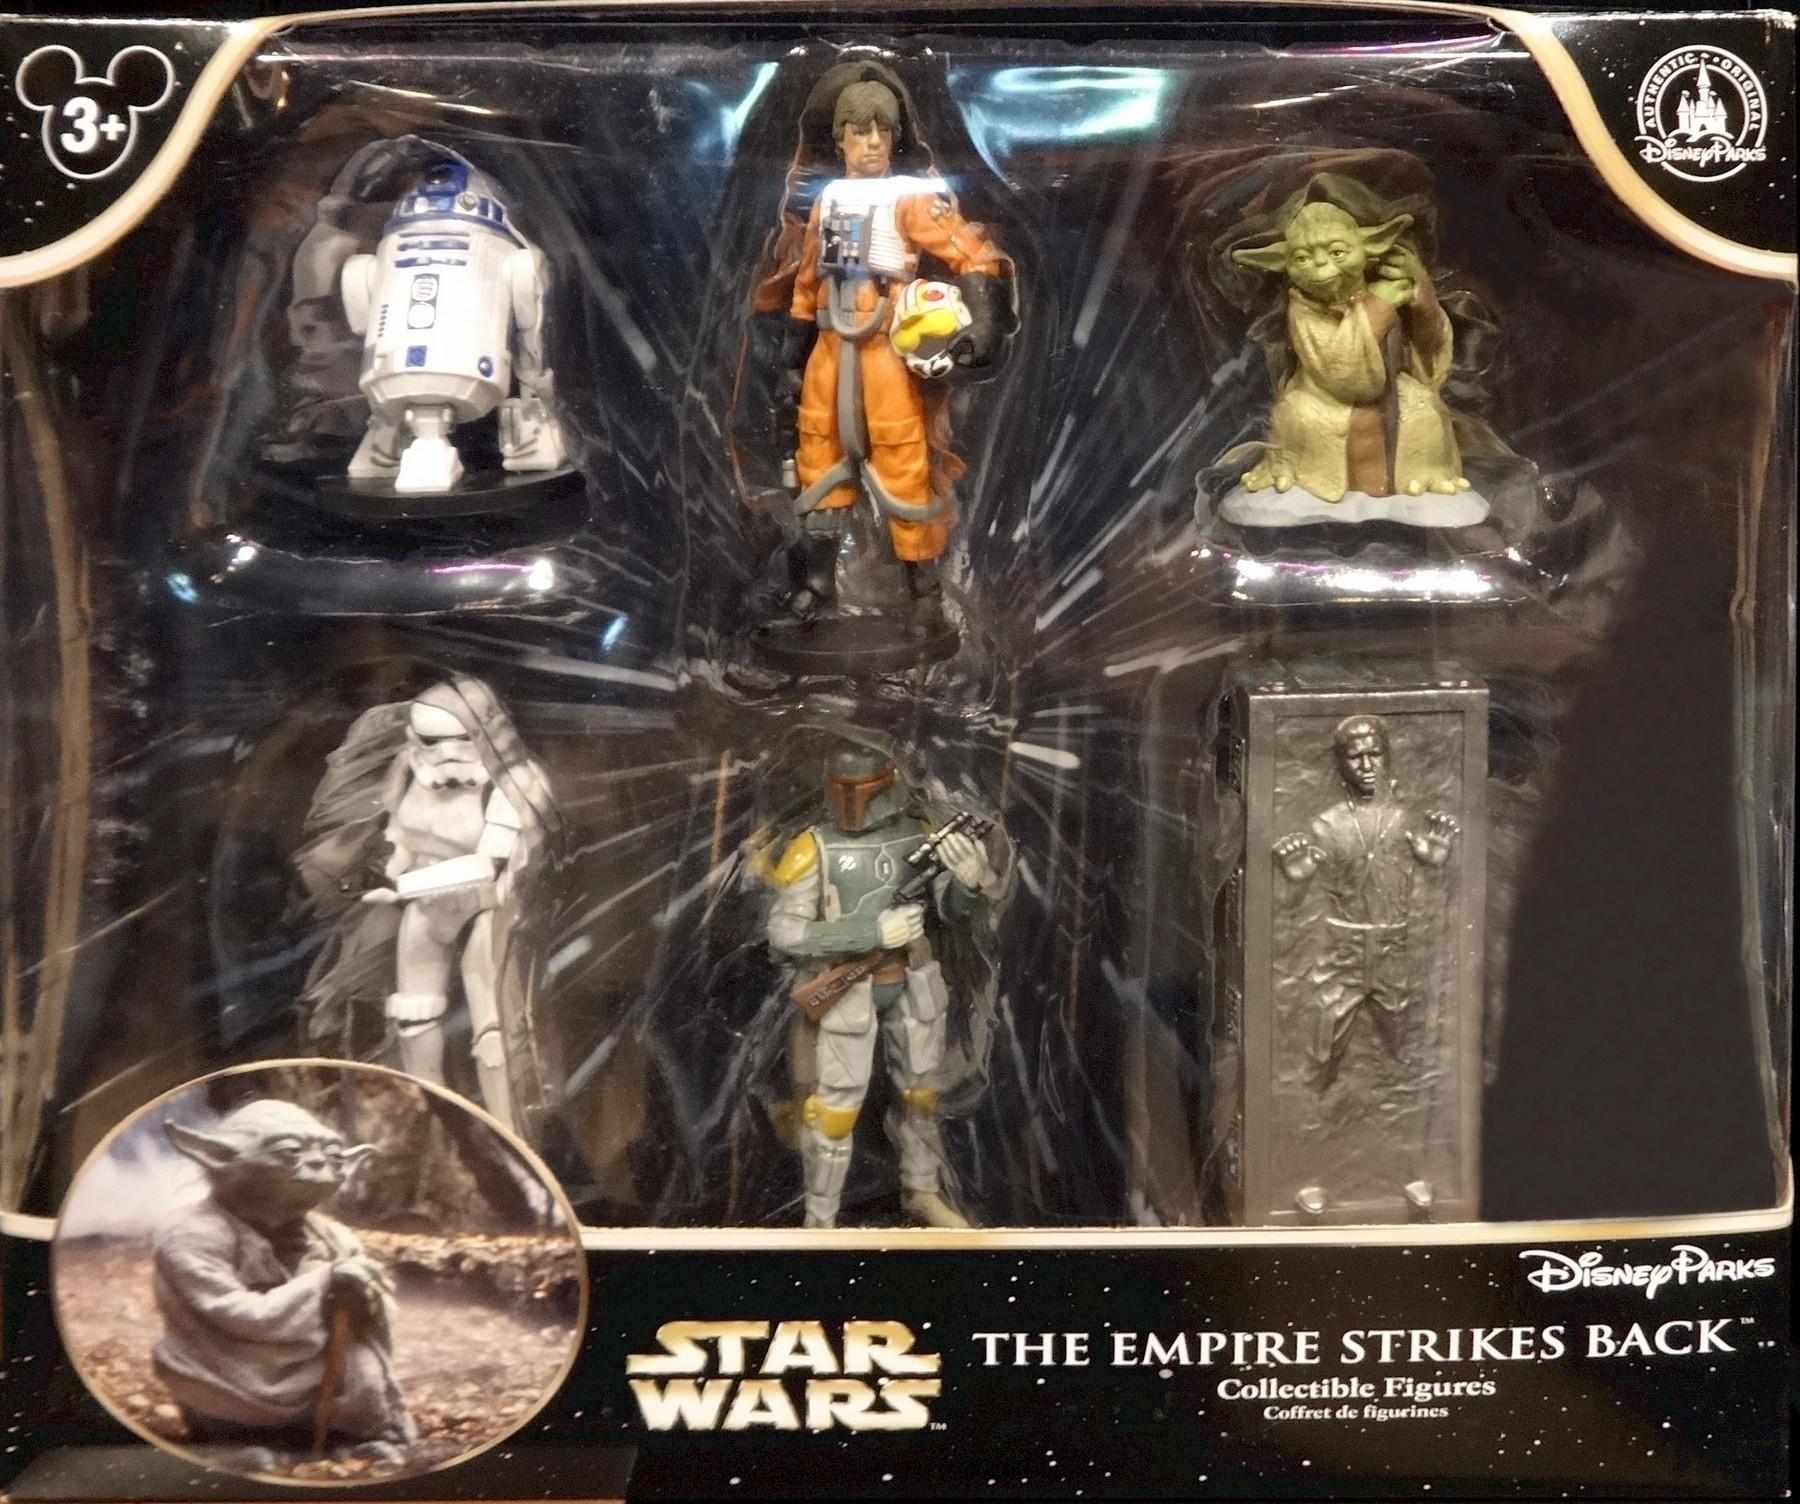 Star Wars The Empire Strikes Back Collectible Figures ~ Disney Star Wars Weekends 2015 © Dizdude.com